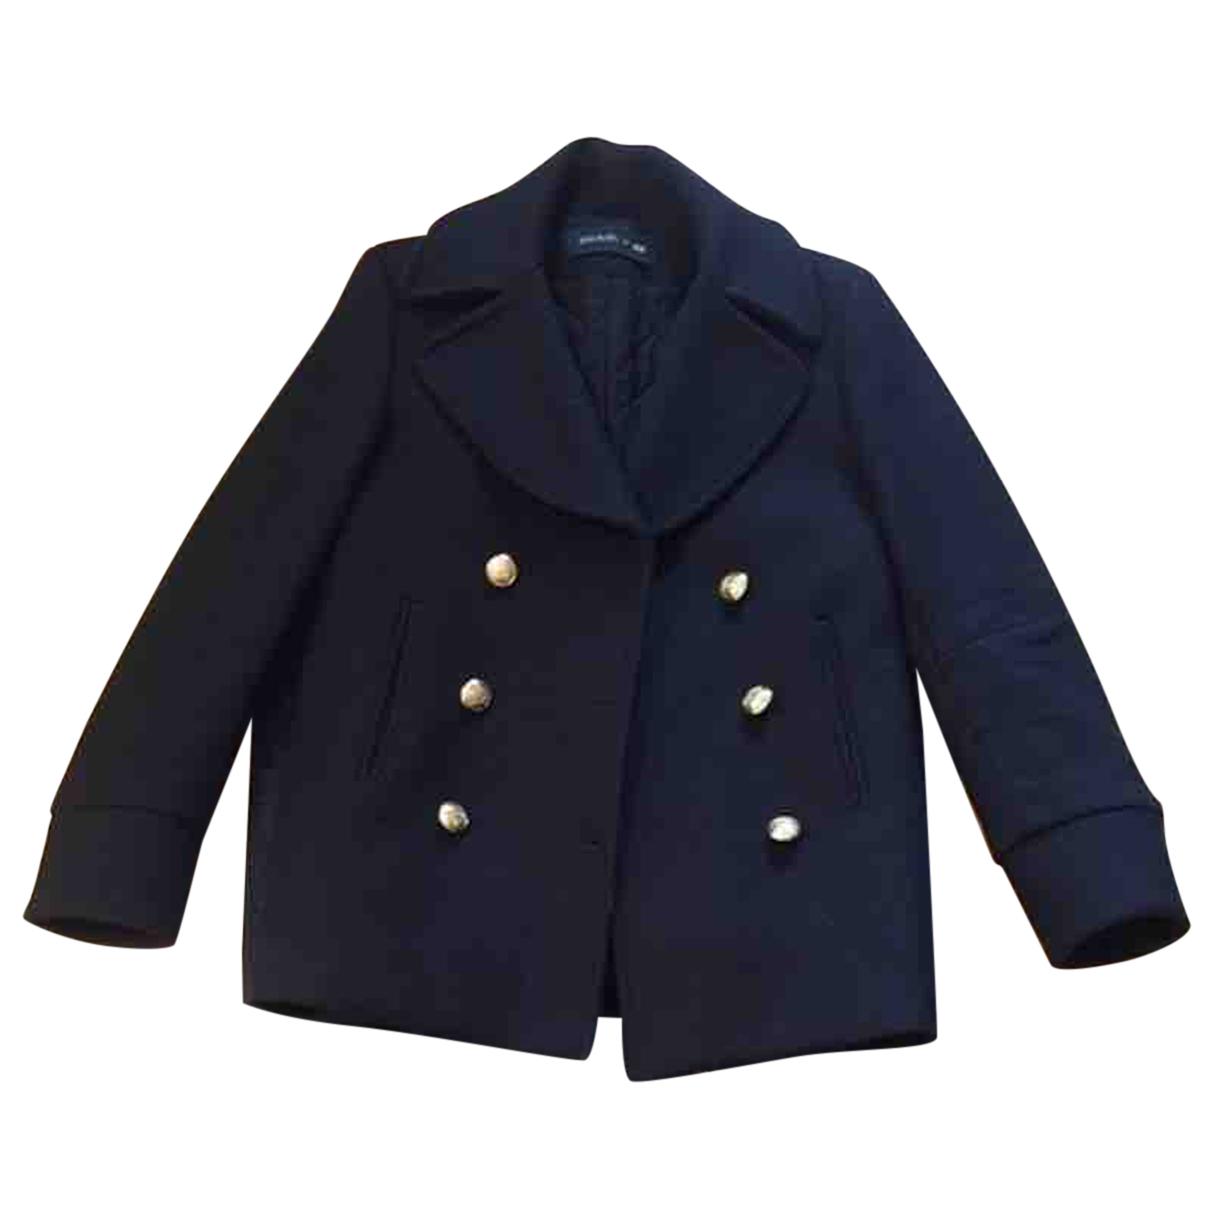 Balmain For H&m N Black Wool jacket for Women 36 FR